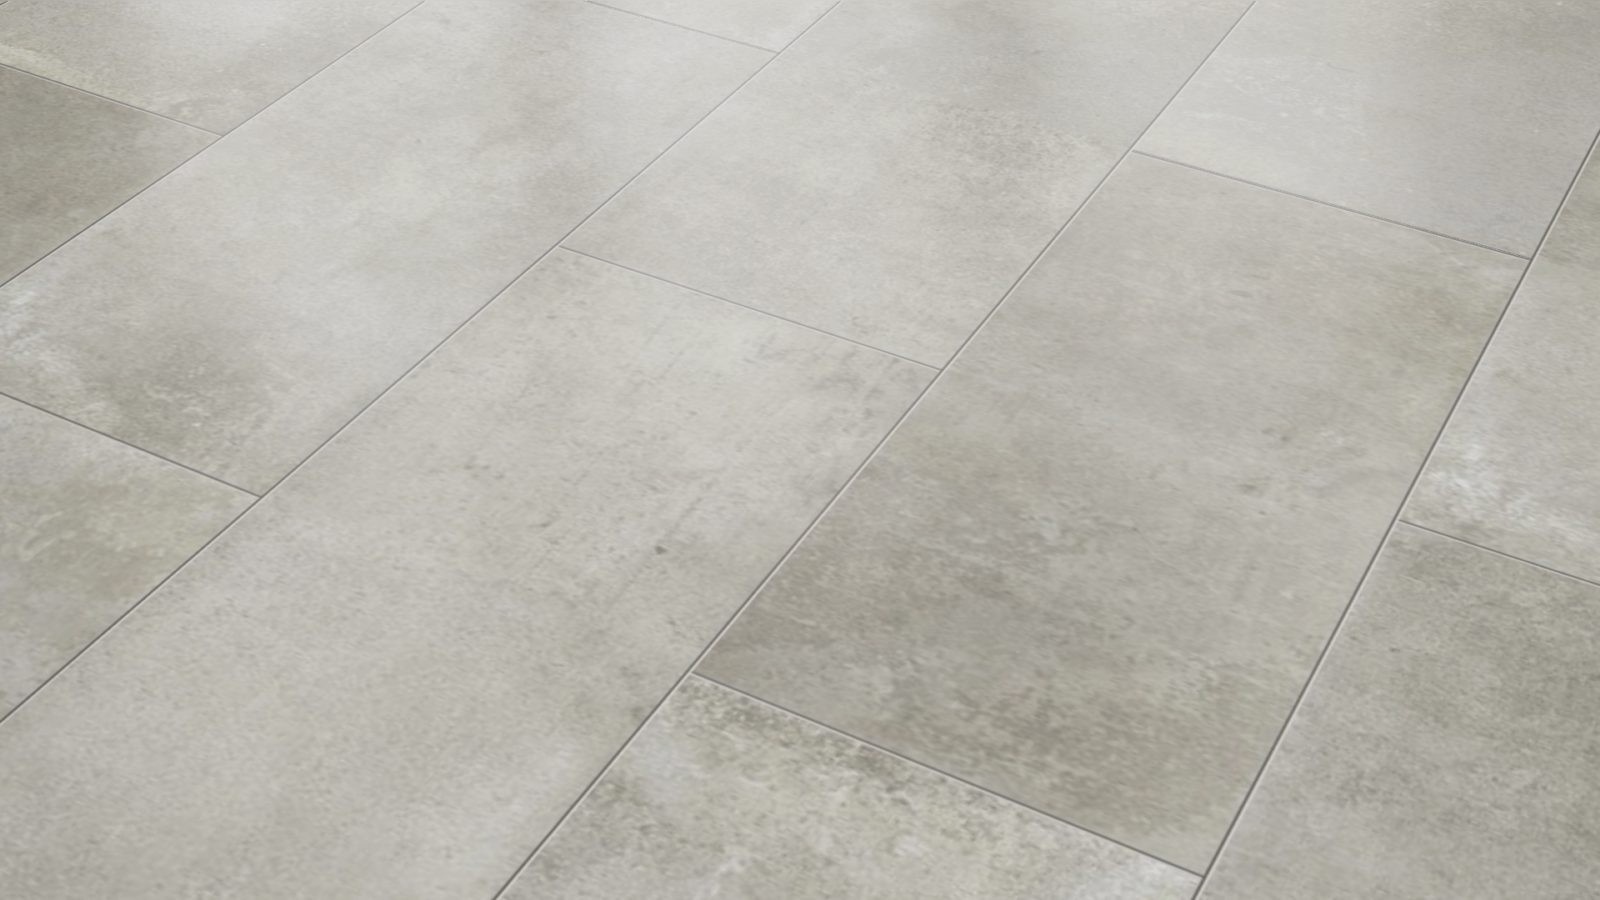 Tegel Laminaat Outlet : Tegel laminaat concrete sand mm laminaatpark